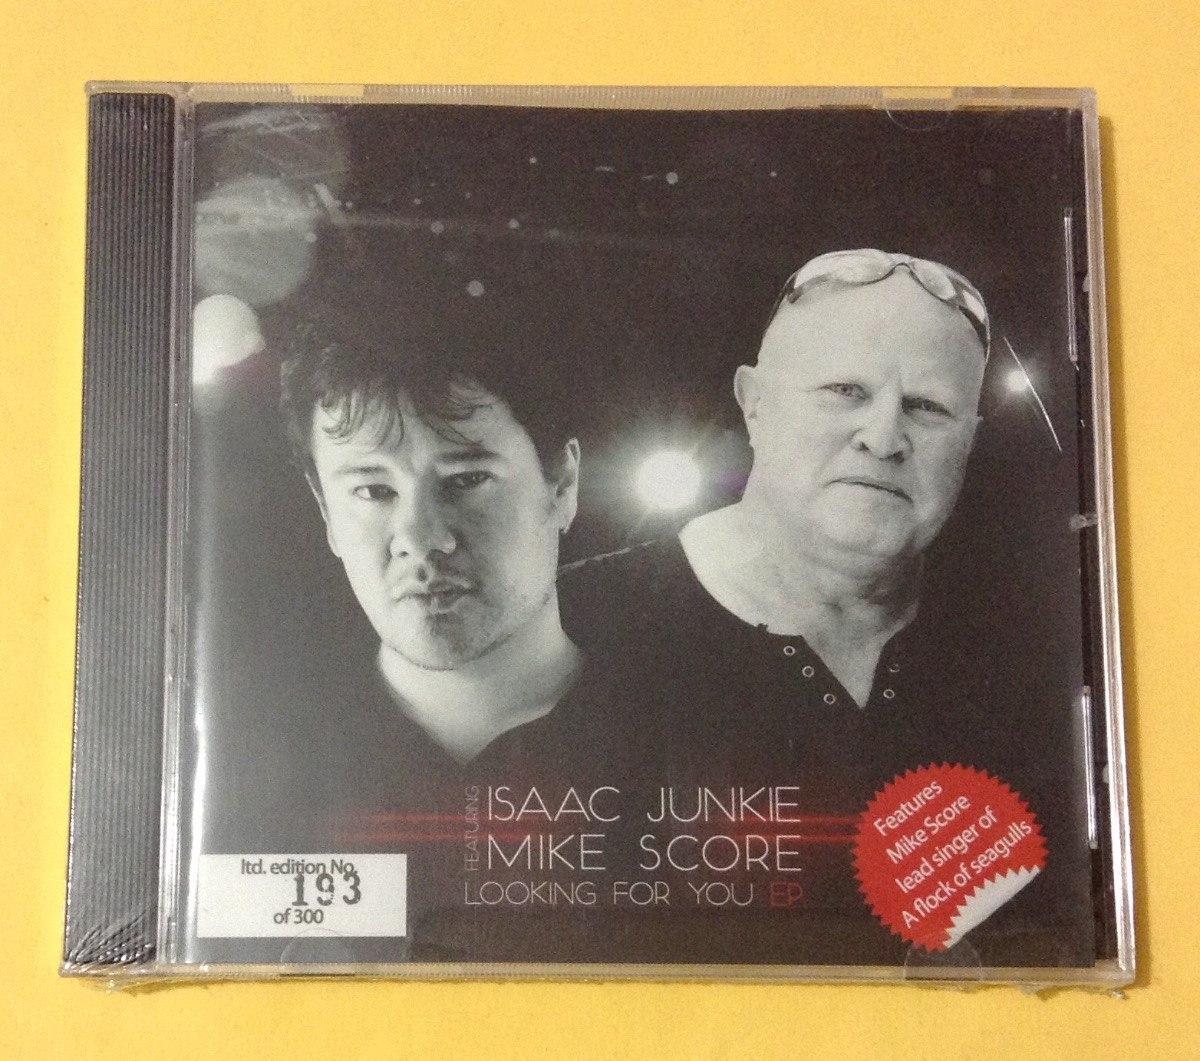 A Flock of Seagulls – I Ran (Isaac Junkie Remix)